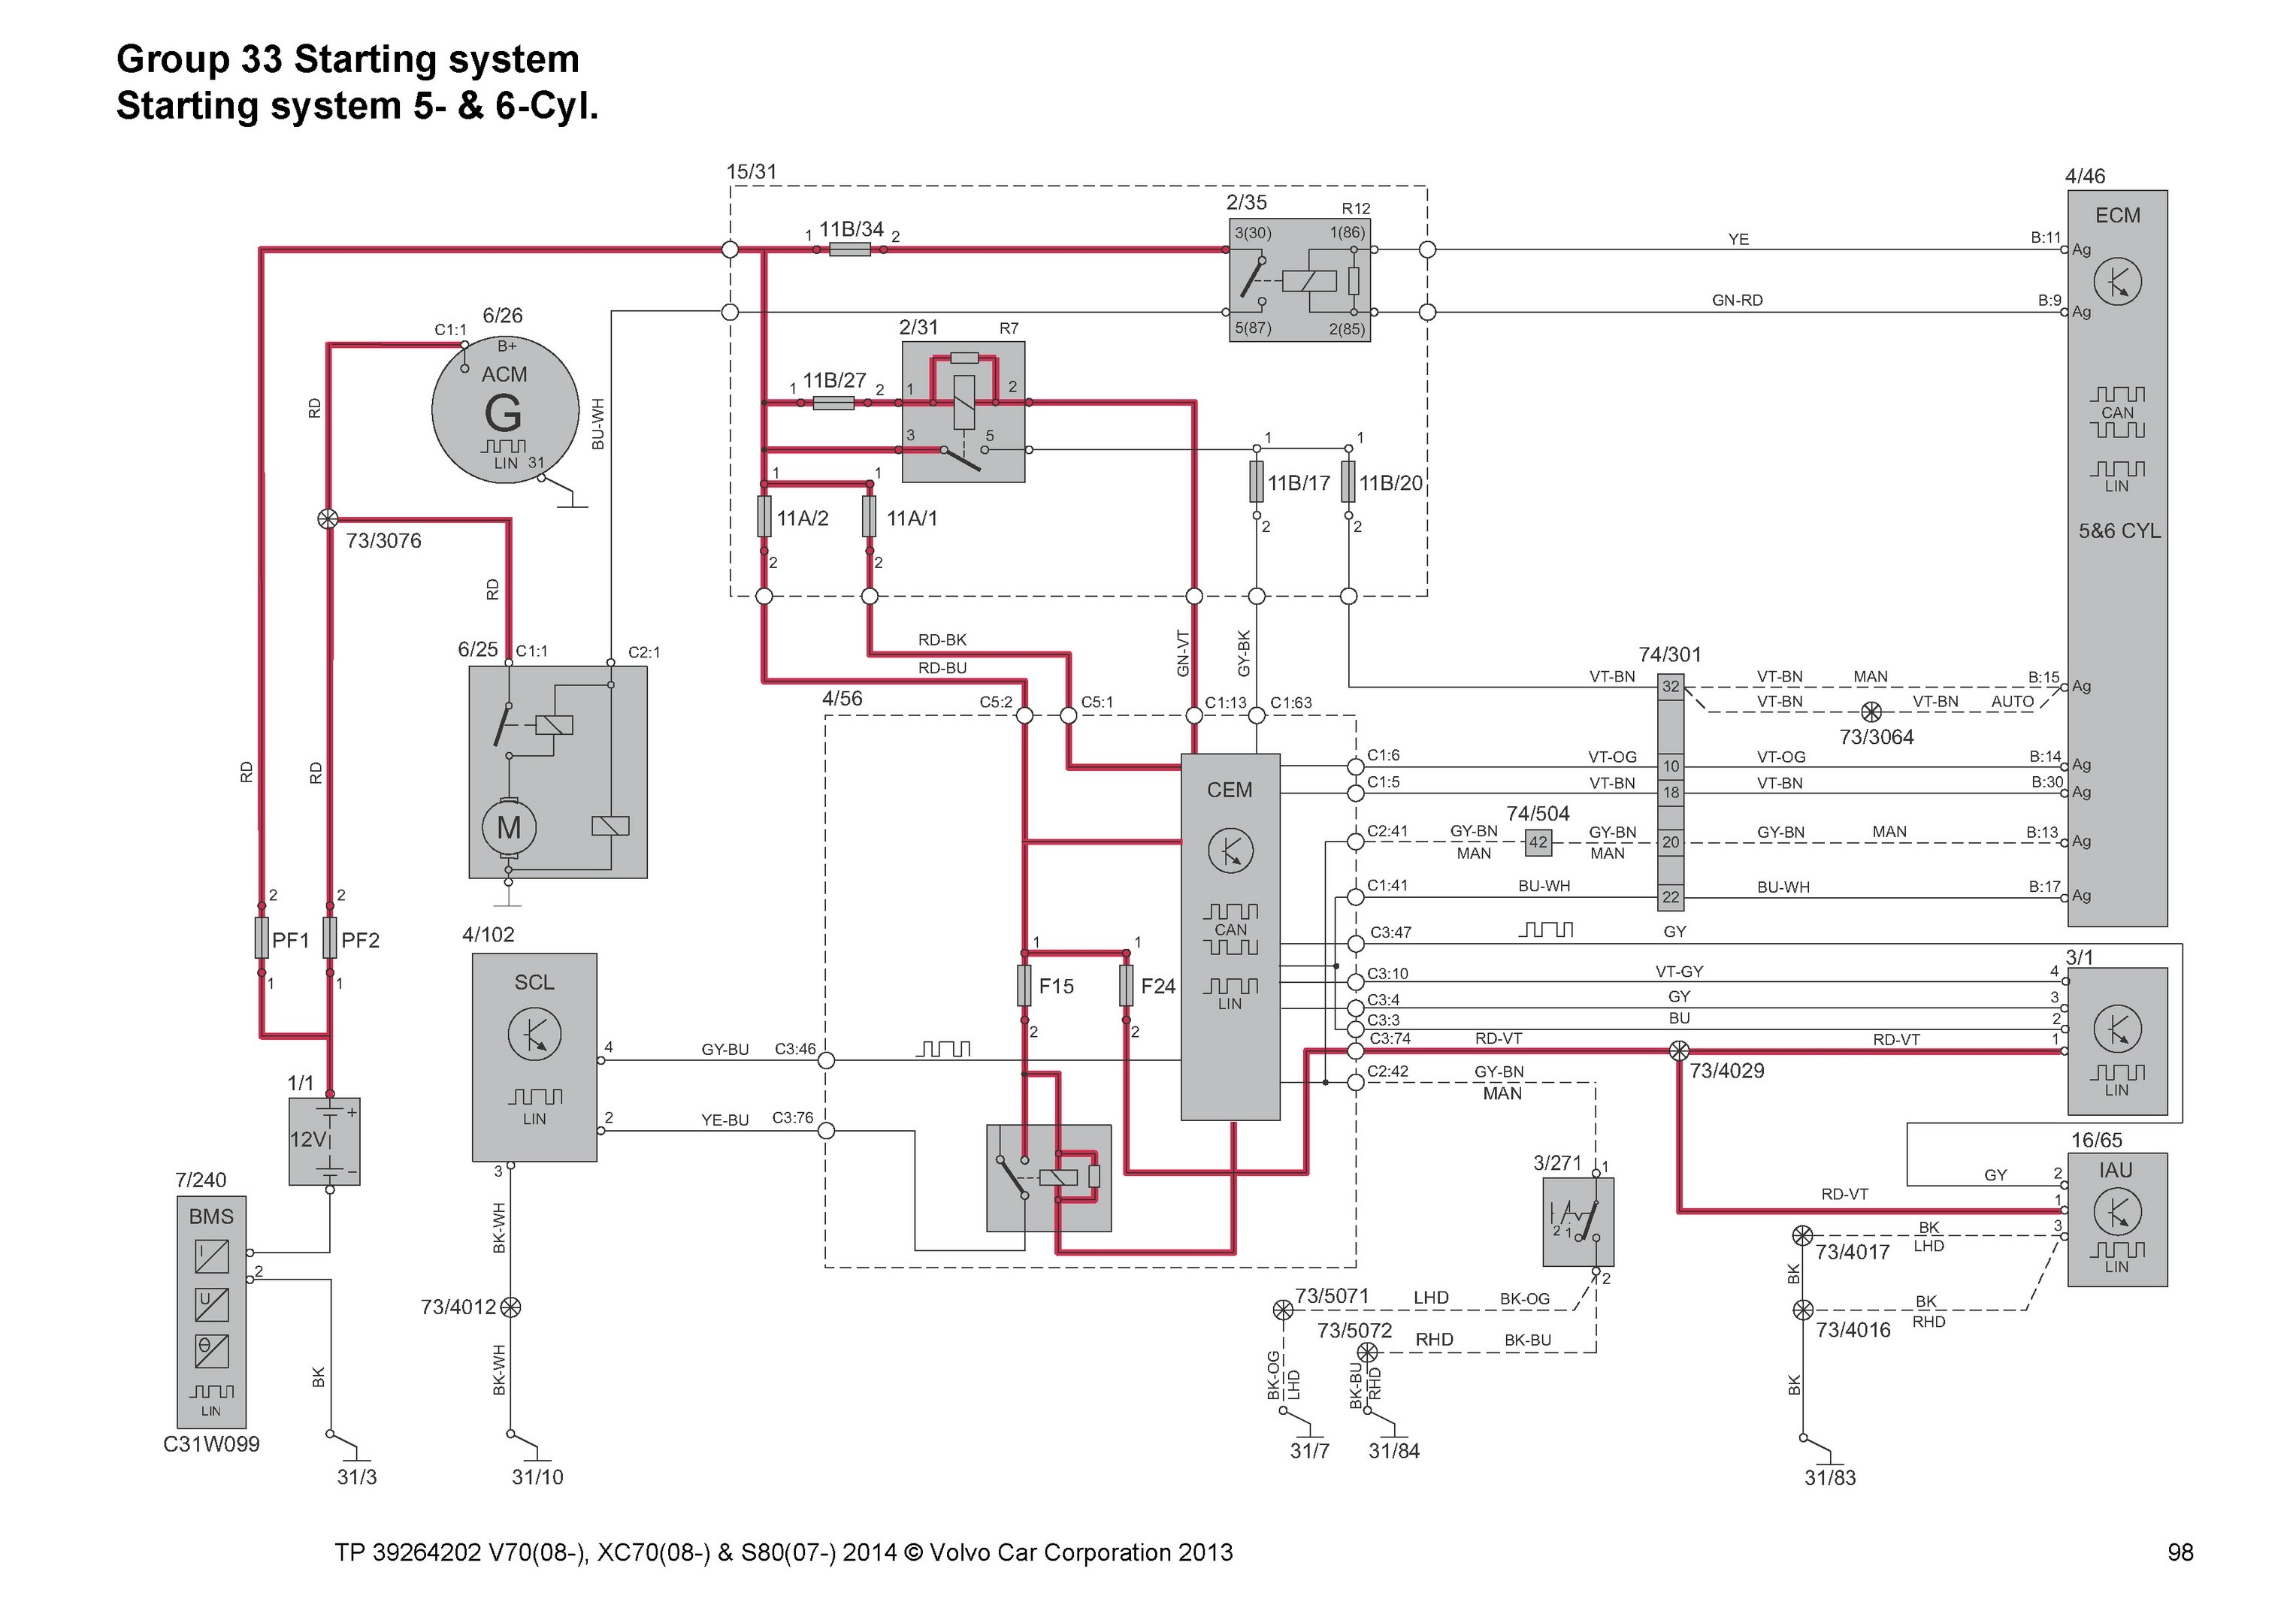 Volvo S80 2000 Wiring Diagram Diagram] Volvo S80 Wiring Diagram 2008 Full Version Hd Of Volvo S80 2000 Wiring Diagram